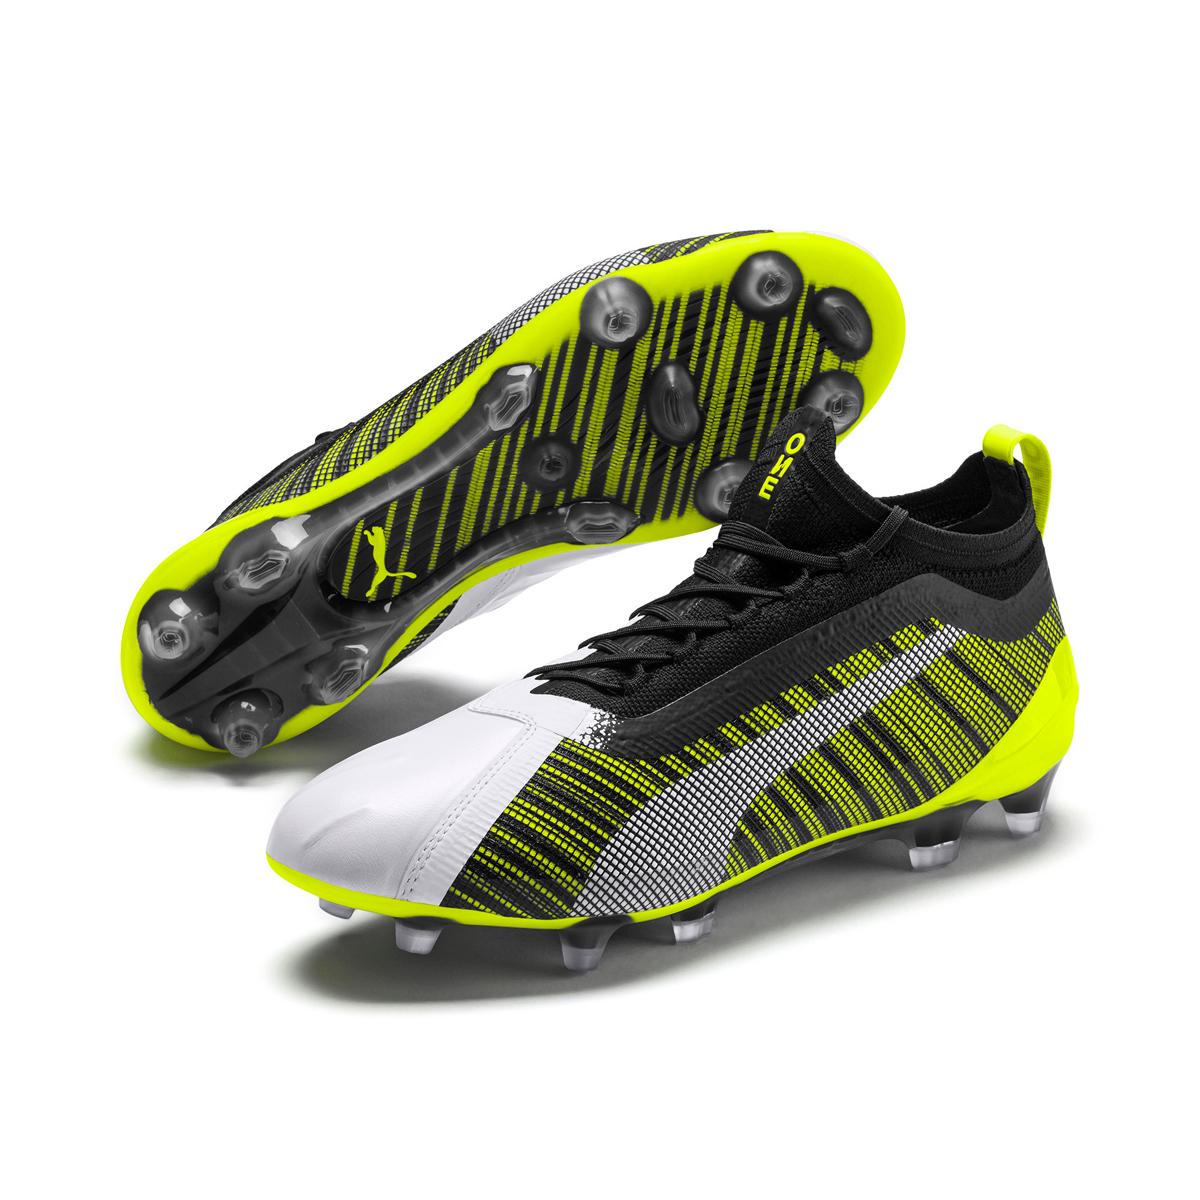 PUMA One 5.1 FG/AG Soccer Cleat White/Black/Yellow Alert-11 ...